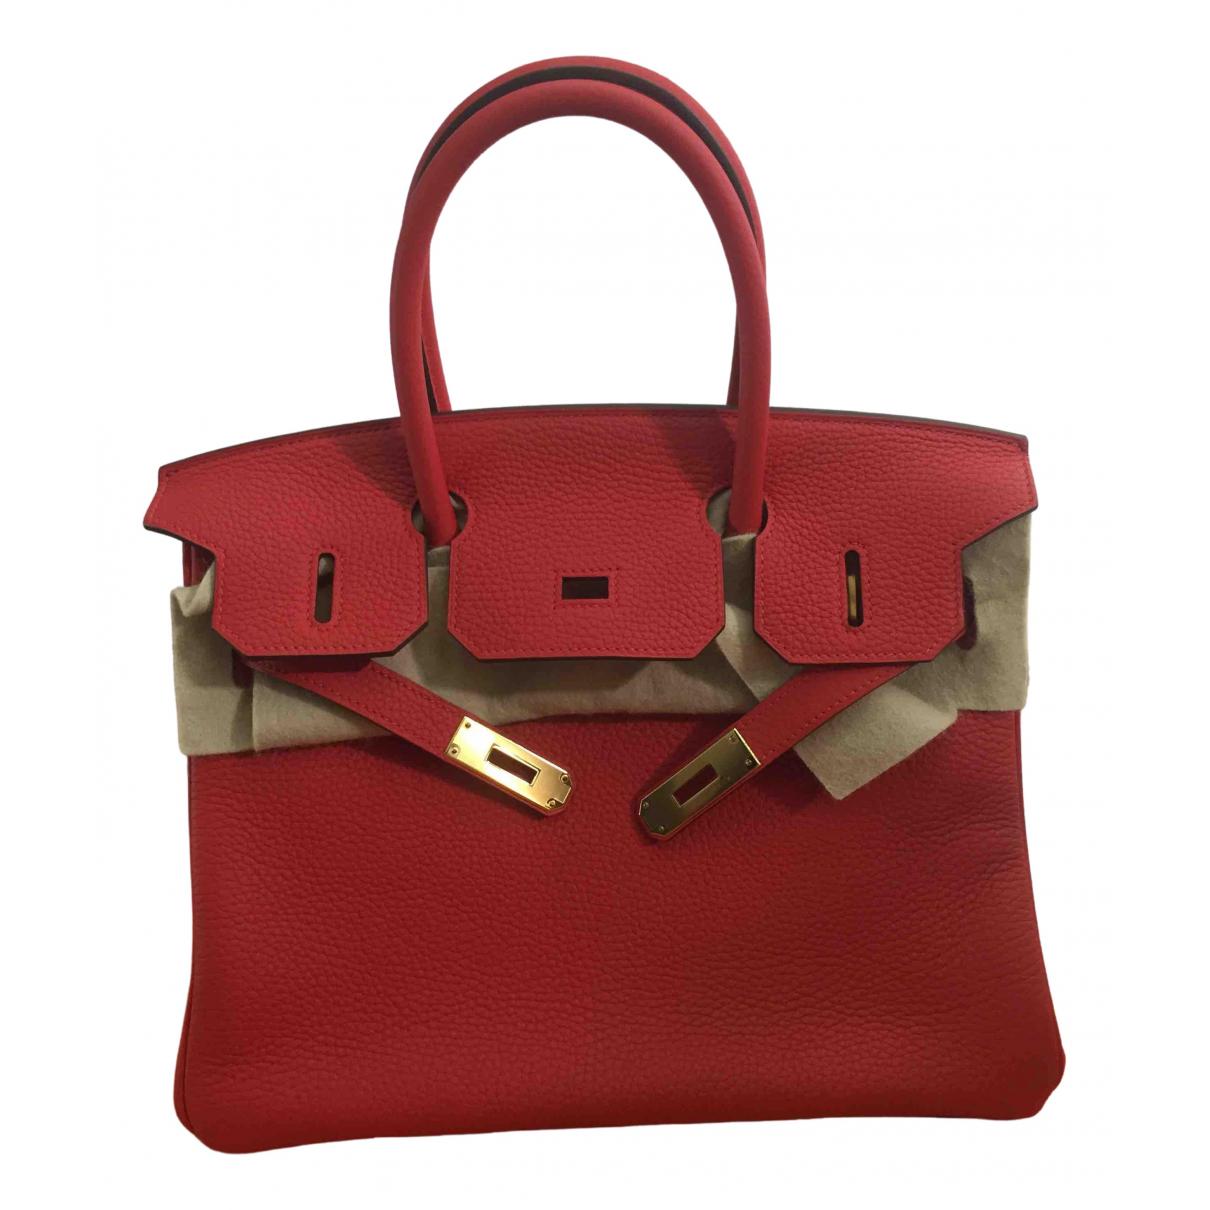 Hermes - Sac a main Birkin 30 pour femme en cuir - rouge